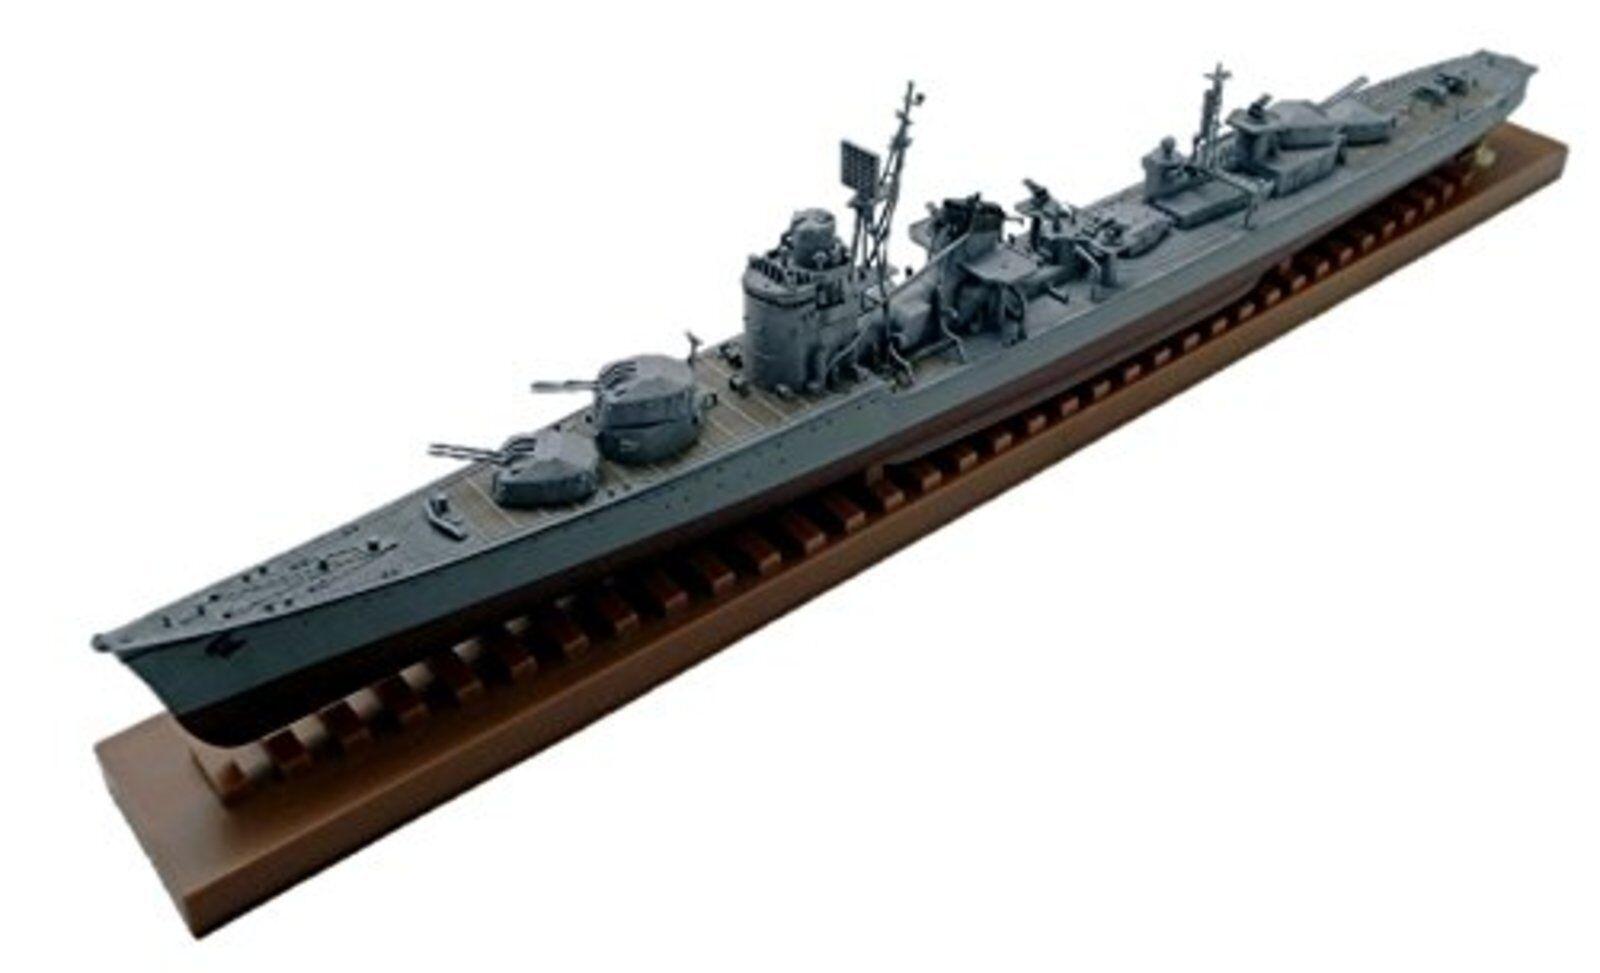 descuento online 1 350 Guerra Barco de de de Japón Destructor Akizuki 1942 1944 KIT de MODELISMO Bb-101  en linea